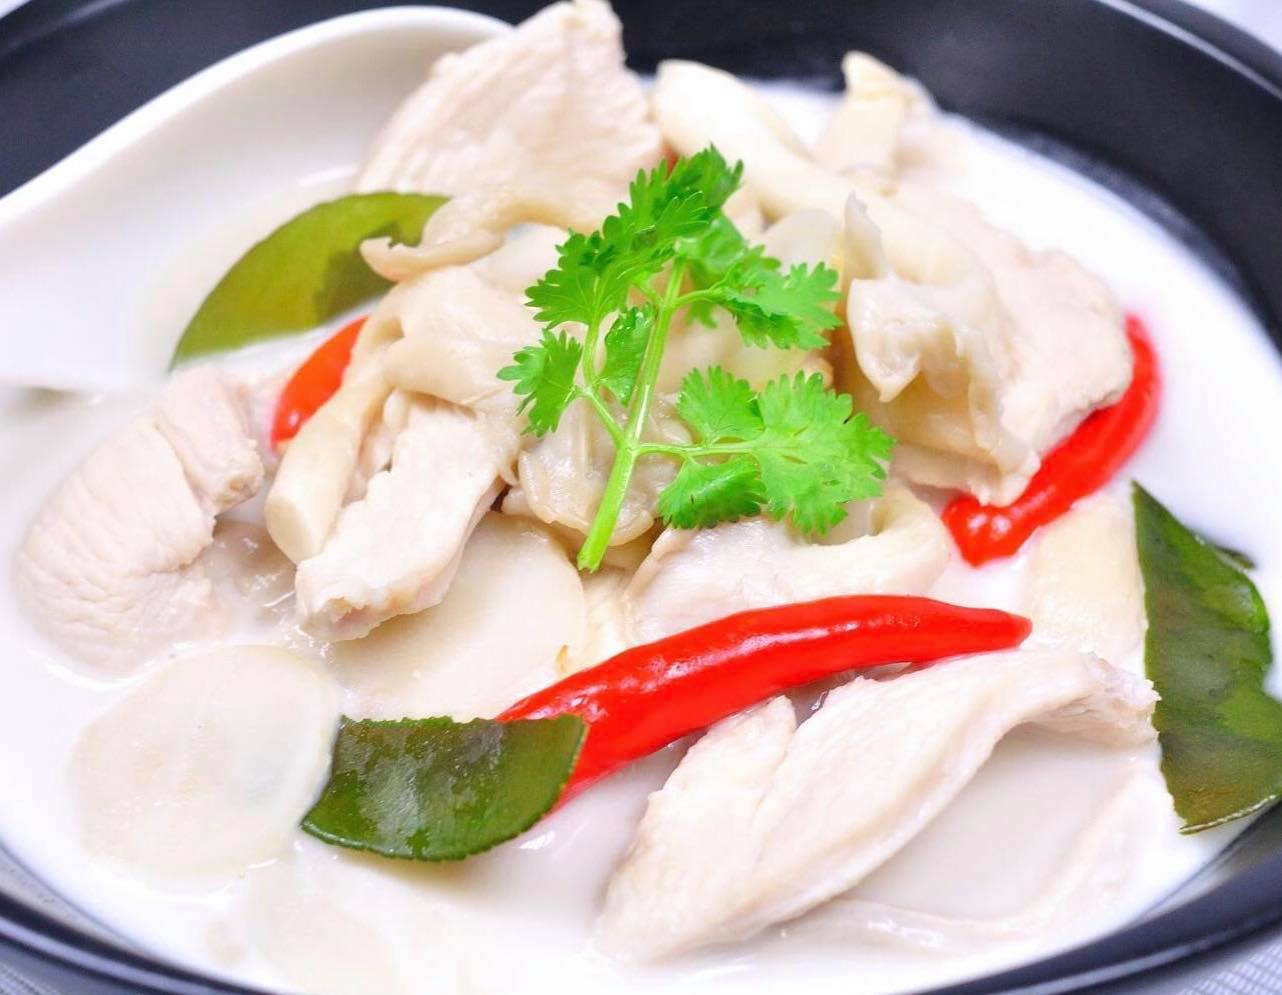 Tom Kha (Coconut Soup)